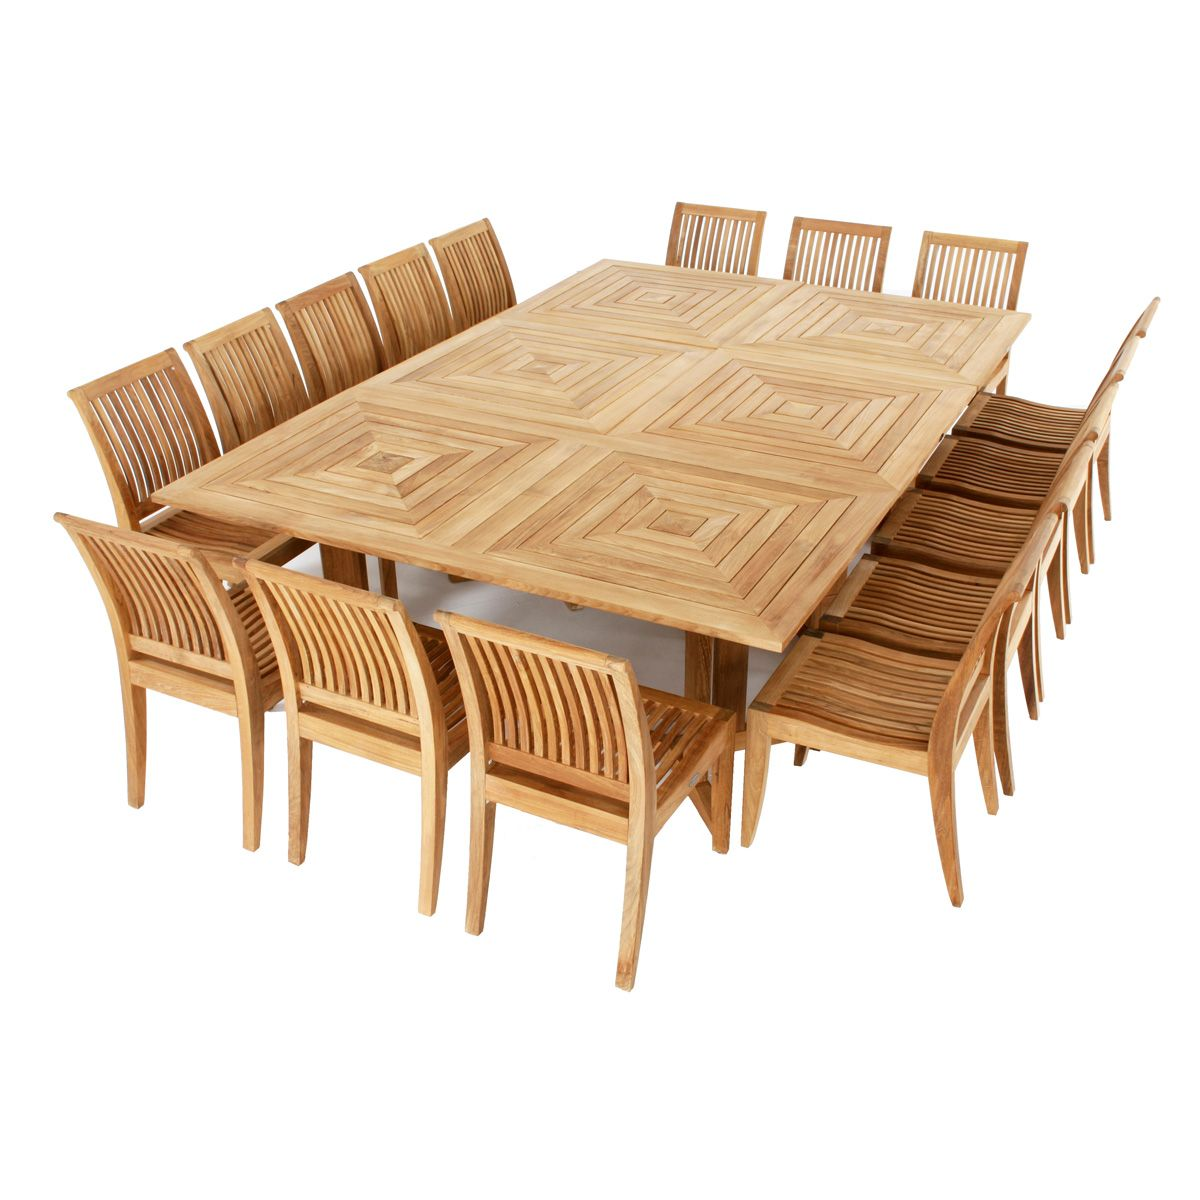 Pyramid Teak Dining Set For 16 Teak Outdoor Furniture Teak